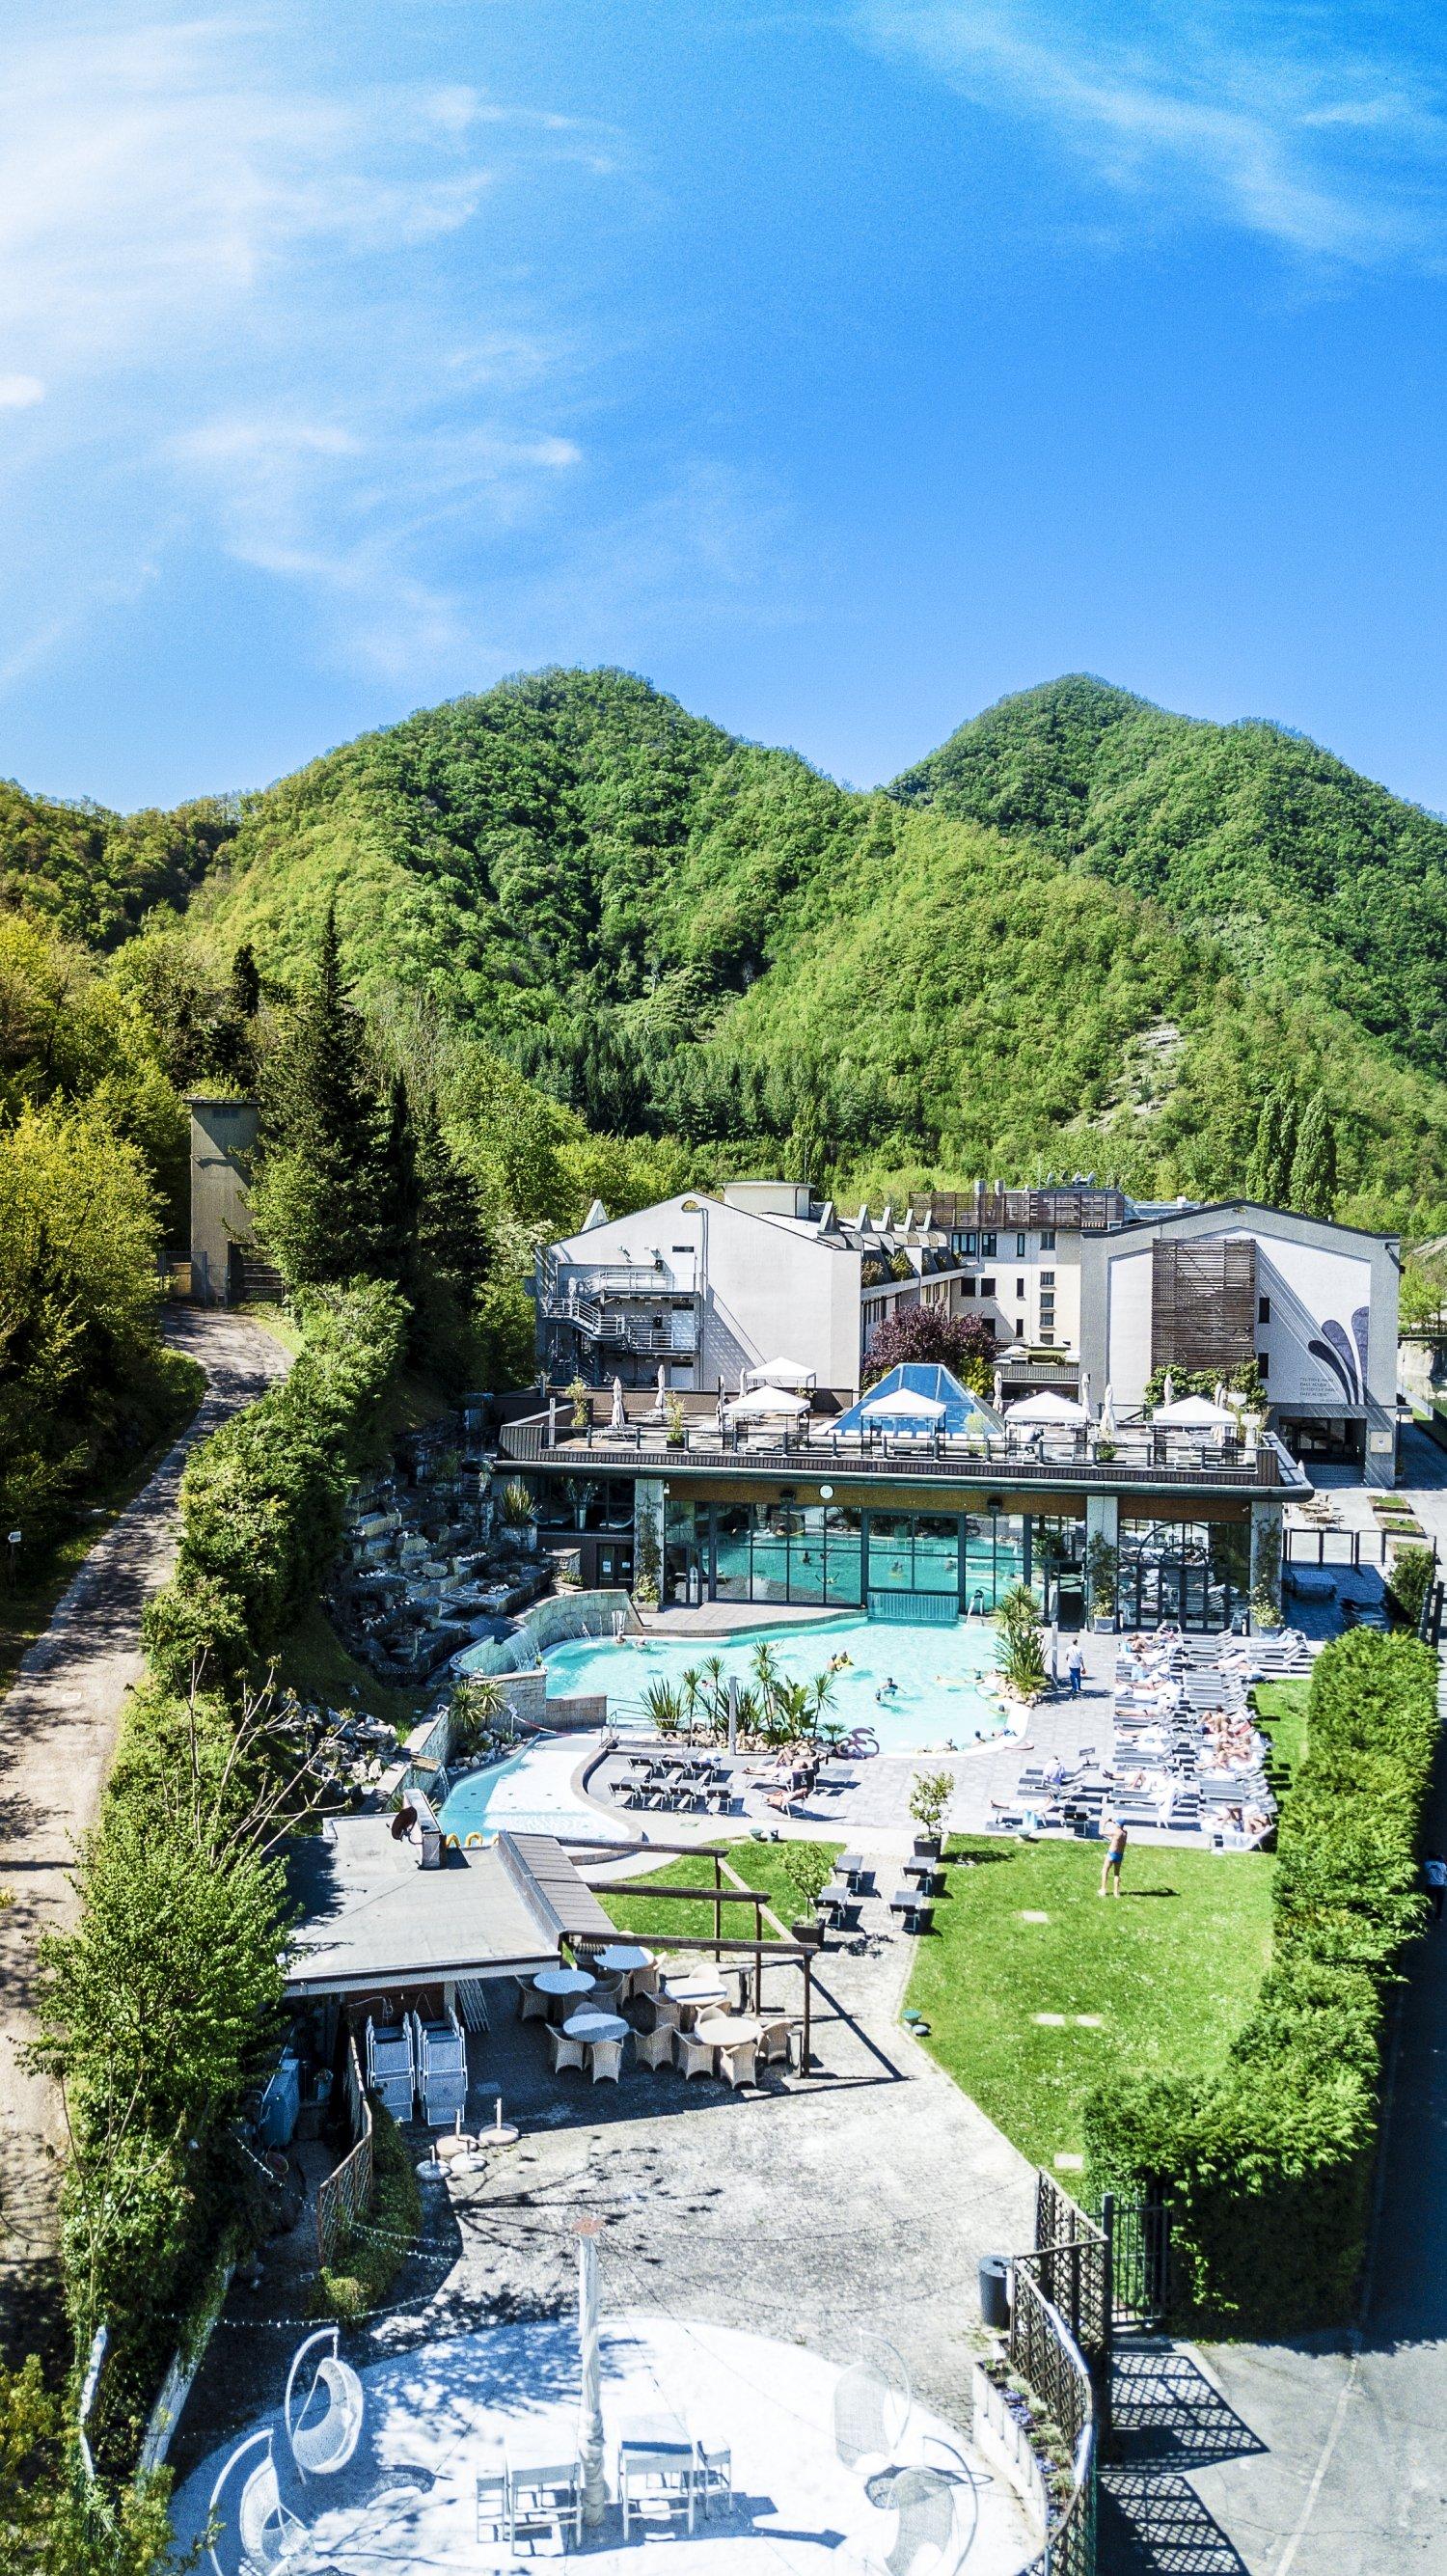 Galleria fotografica r seo euroterme resort 4 - Hotel bagno di romagna ...